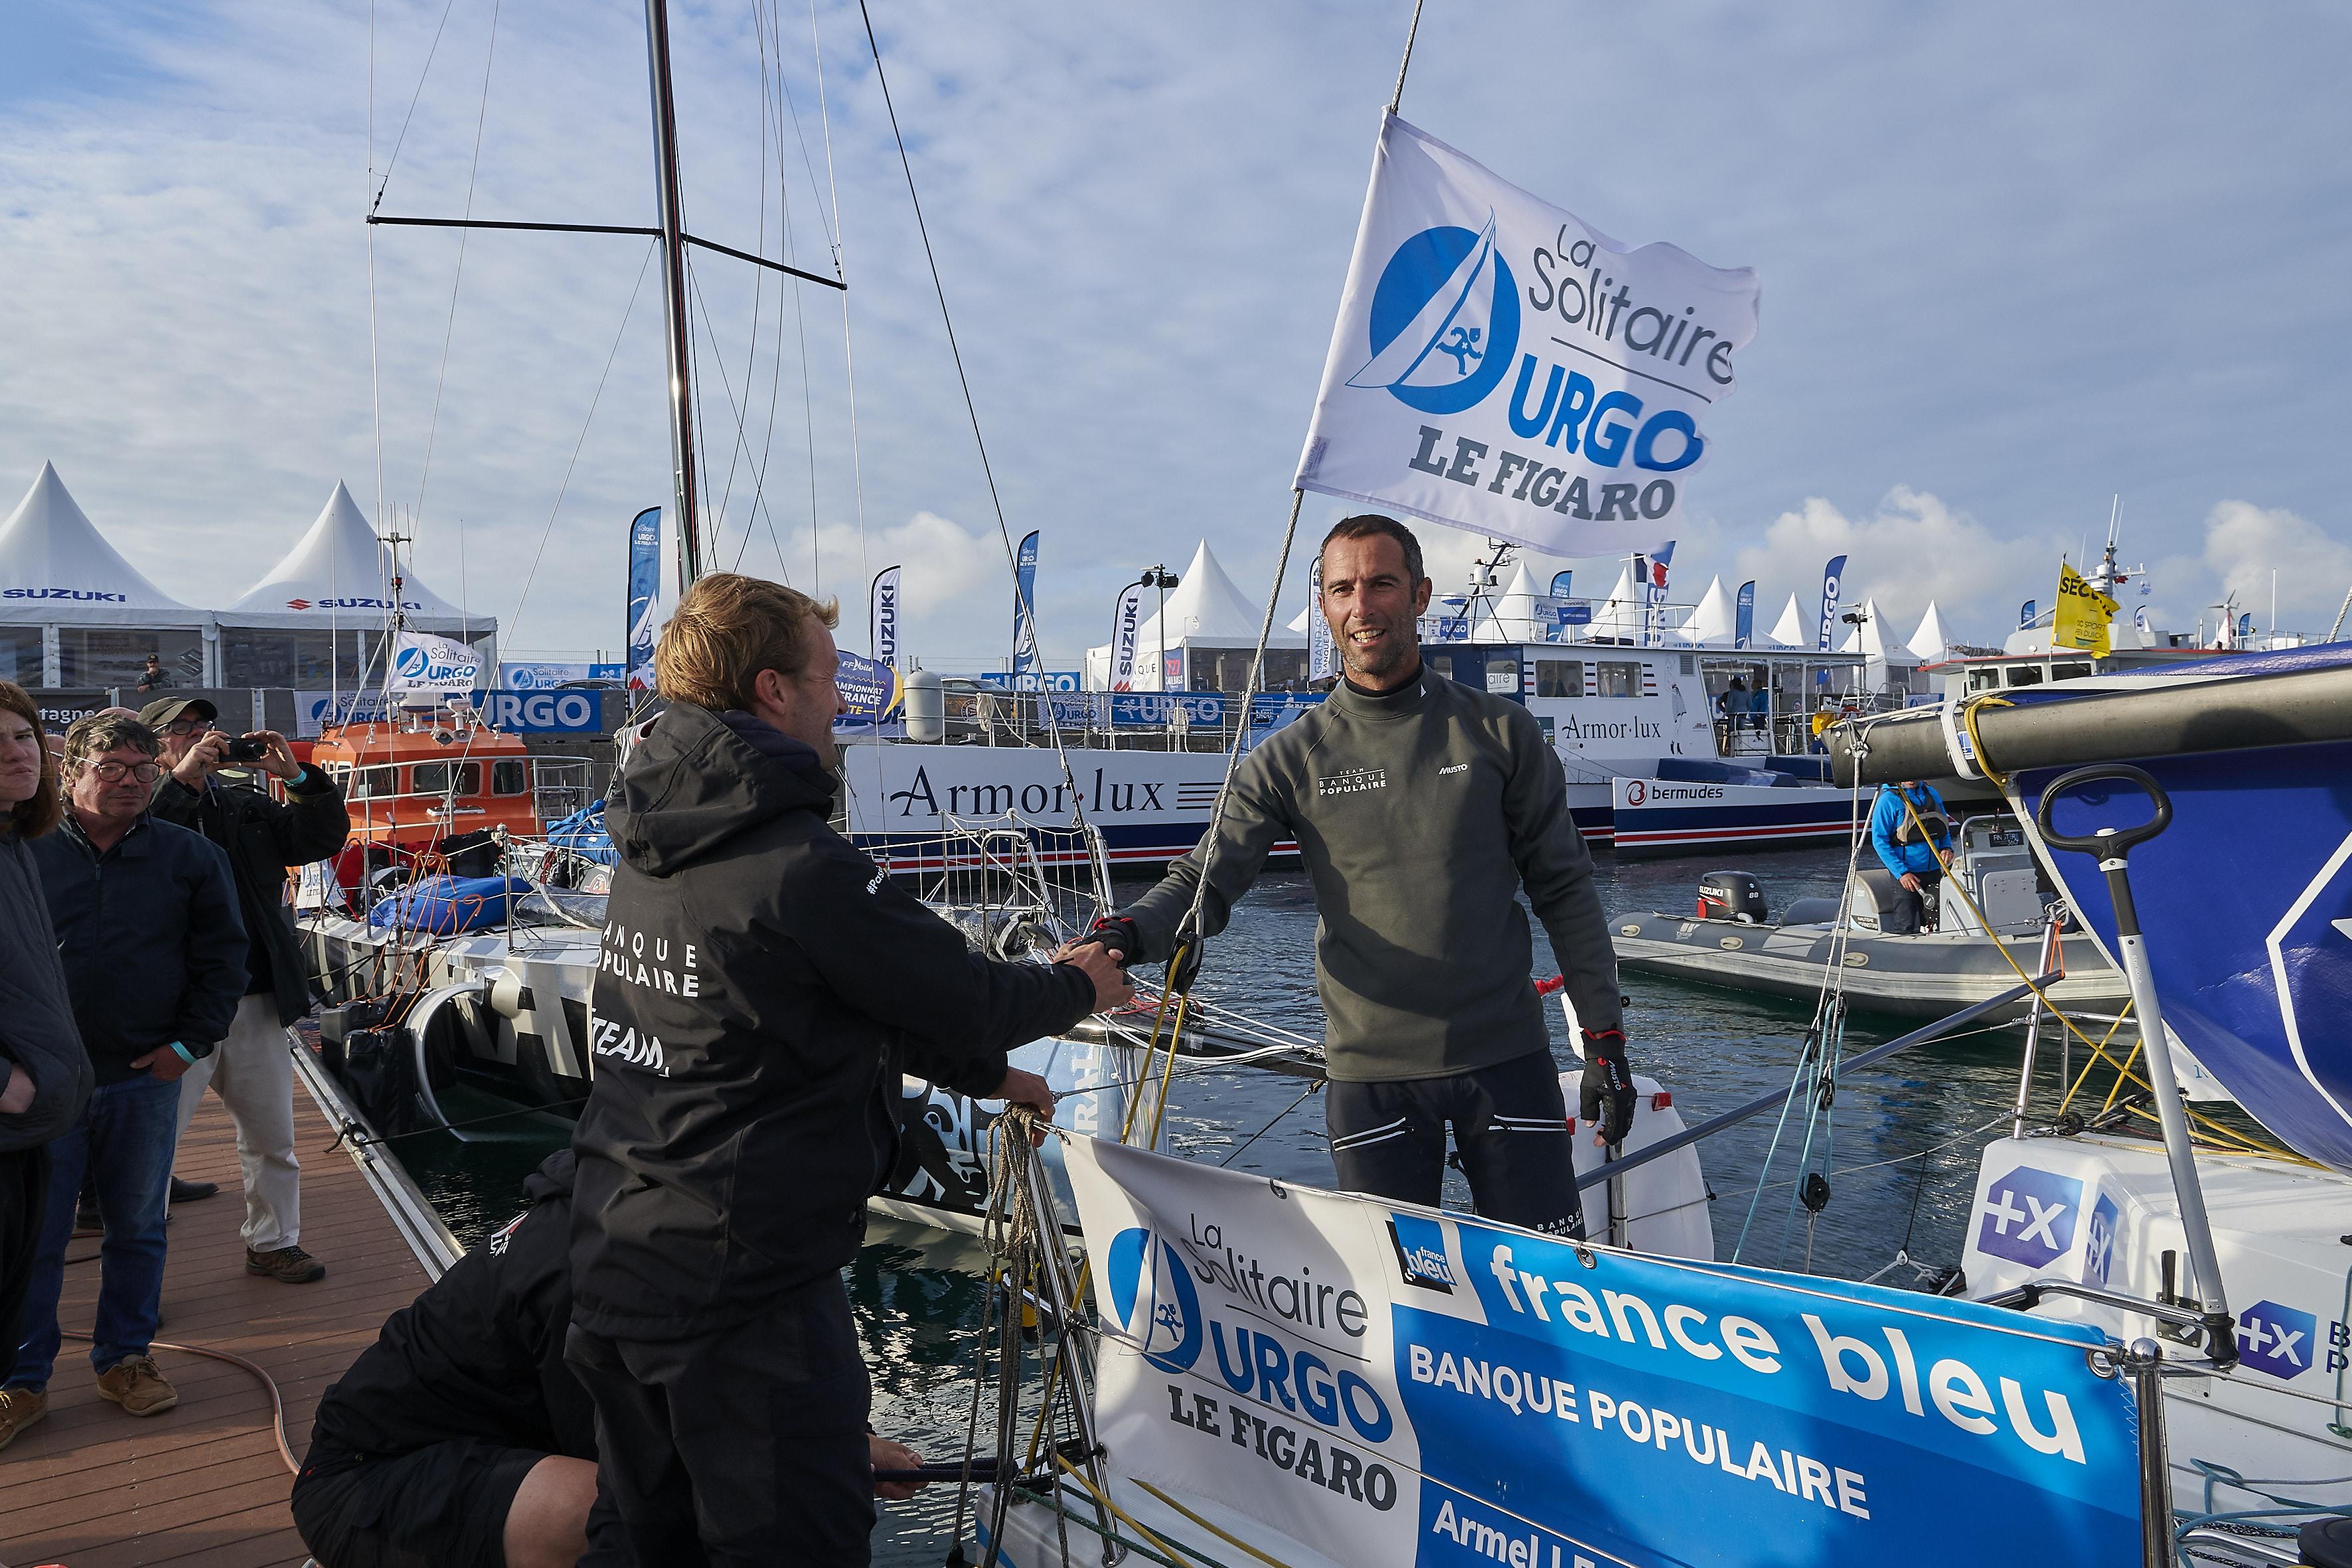 Solitaire Urgo Le Figaro 2019